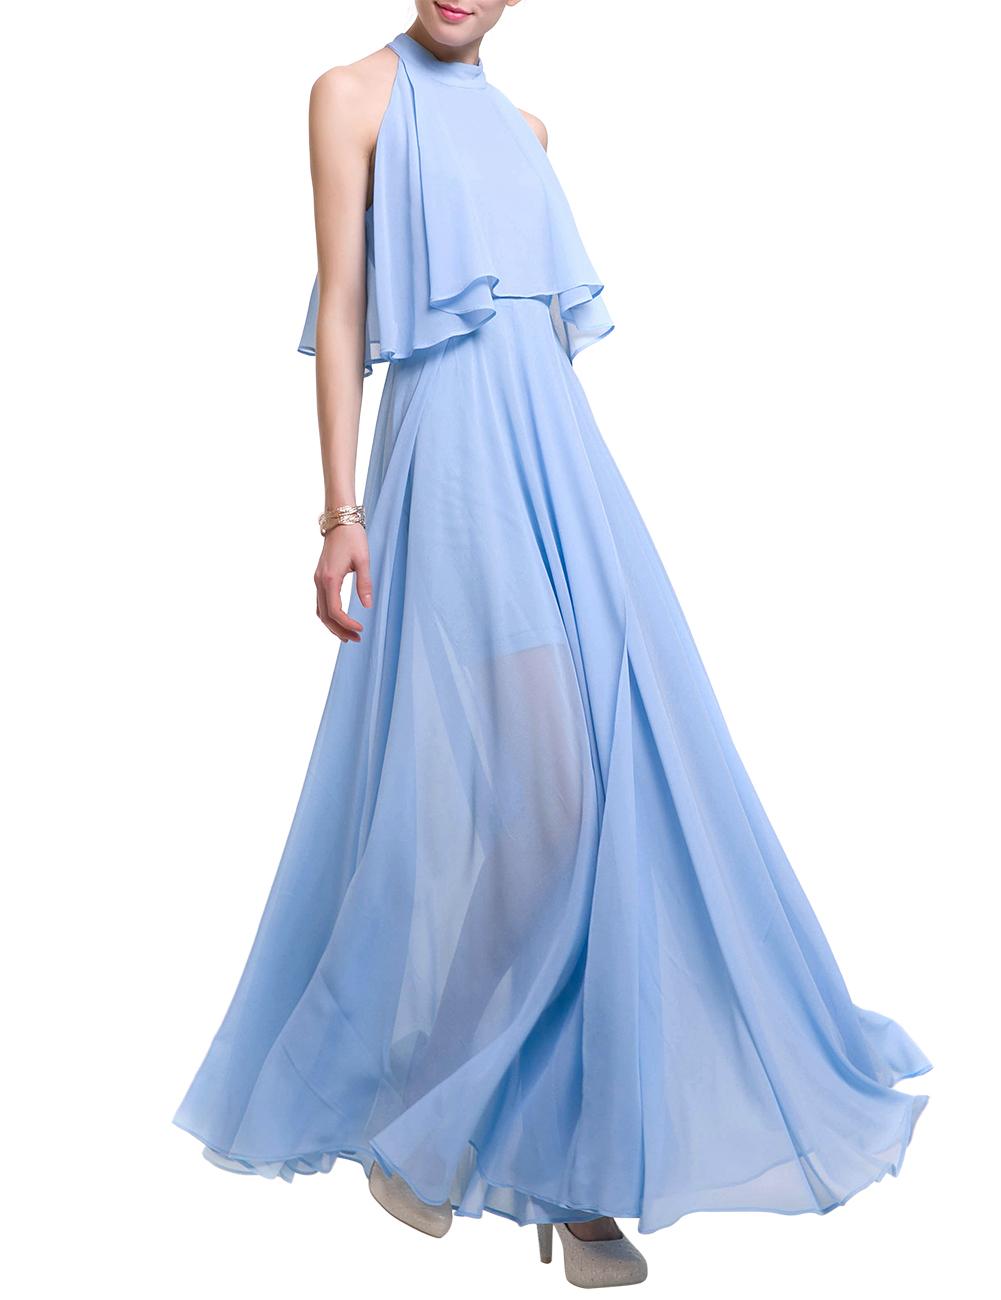 GlorySunshine Women Solid Sleeveless Halter Pleated Chiffon Slit Maxi Dress